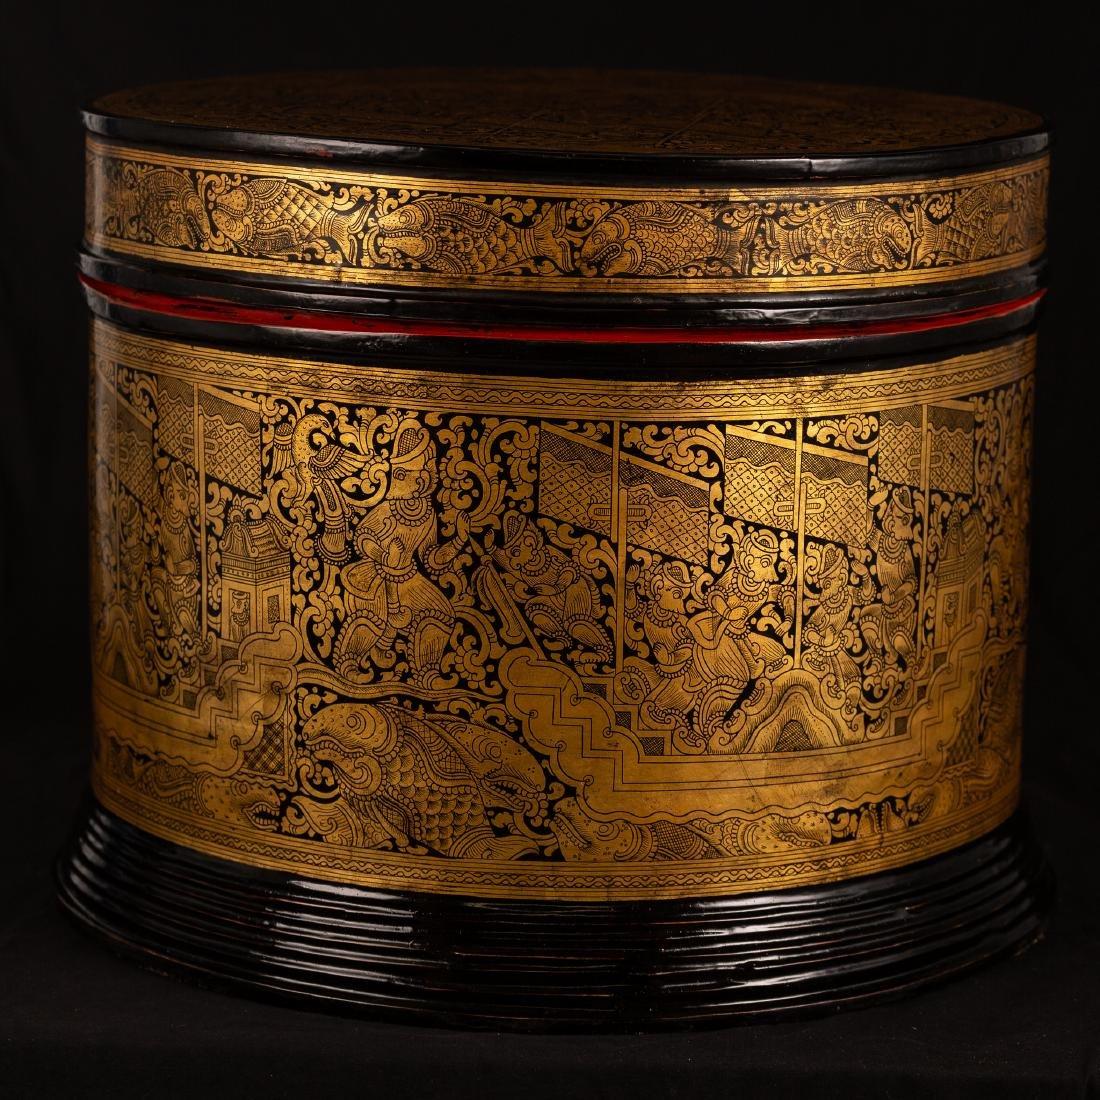 19th Century Burmese Lacquerware Monks Robe Box - 4